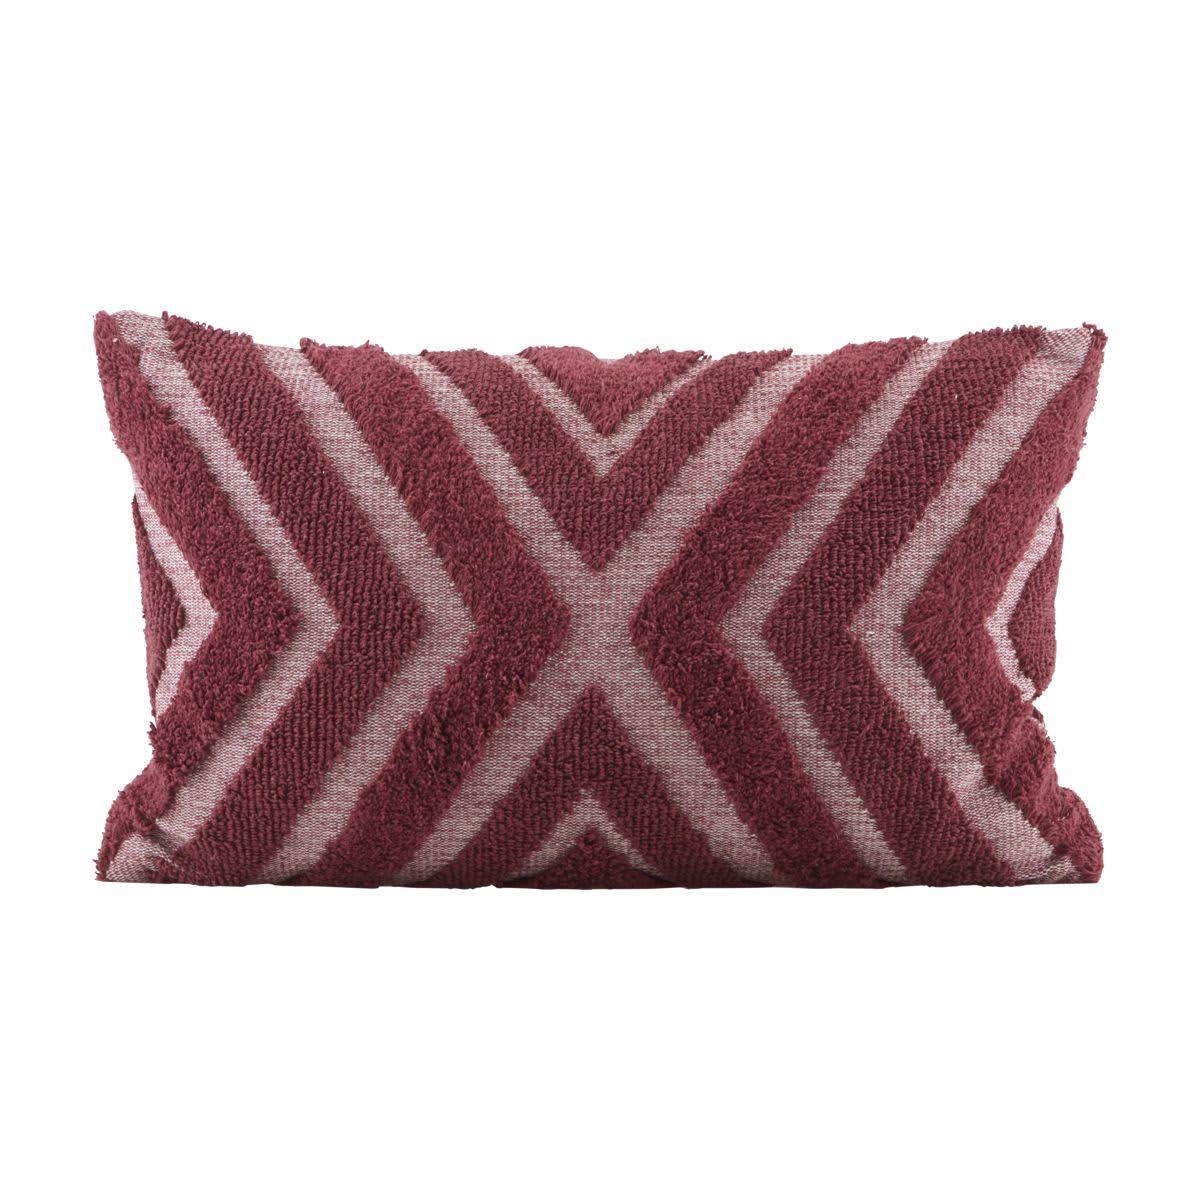 House Doctor Burnt Henna Textured Cushion Cover